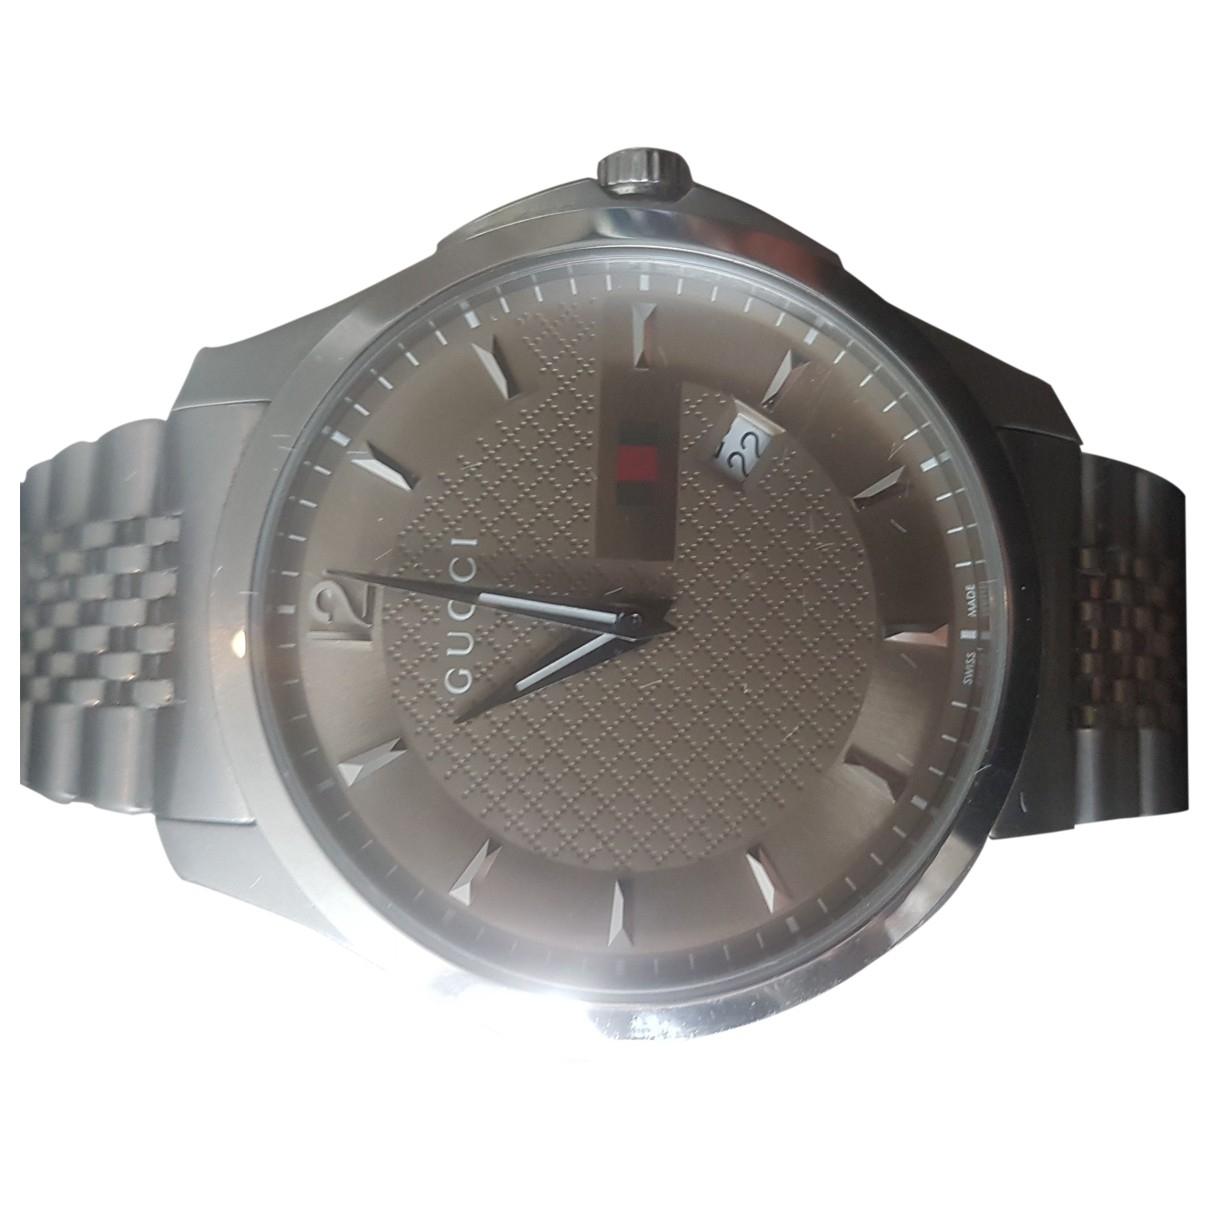 Relojes G-Chrono de Plata Gucci